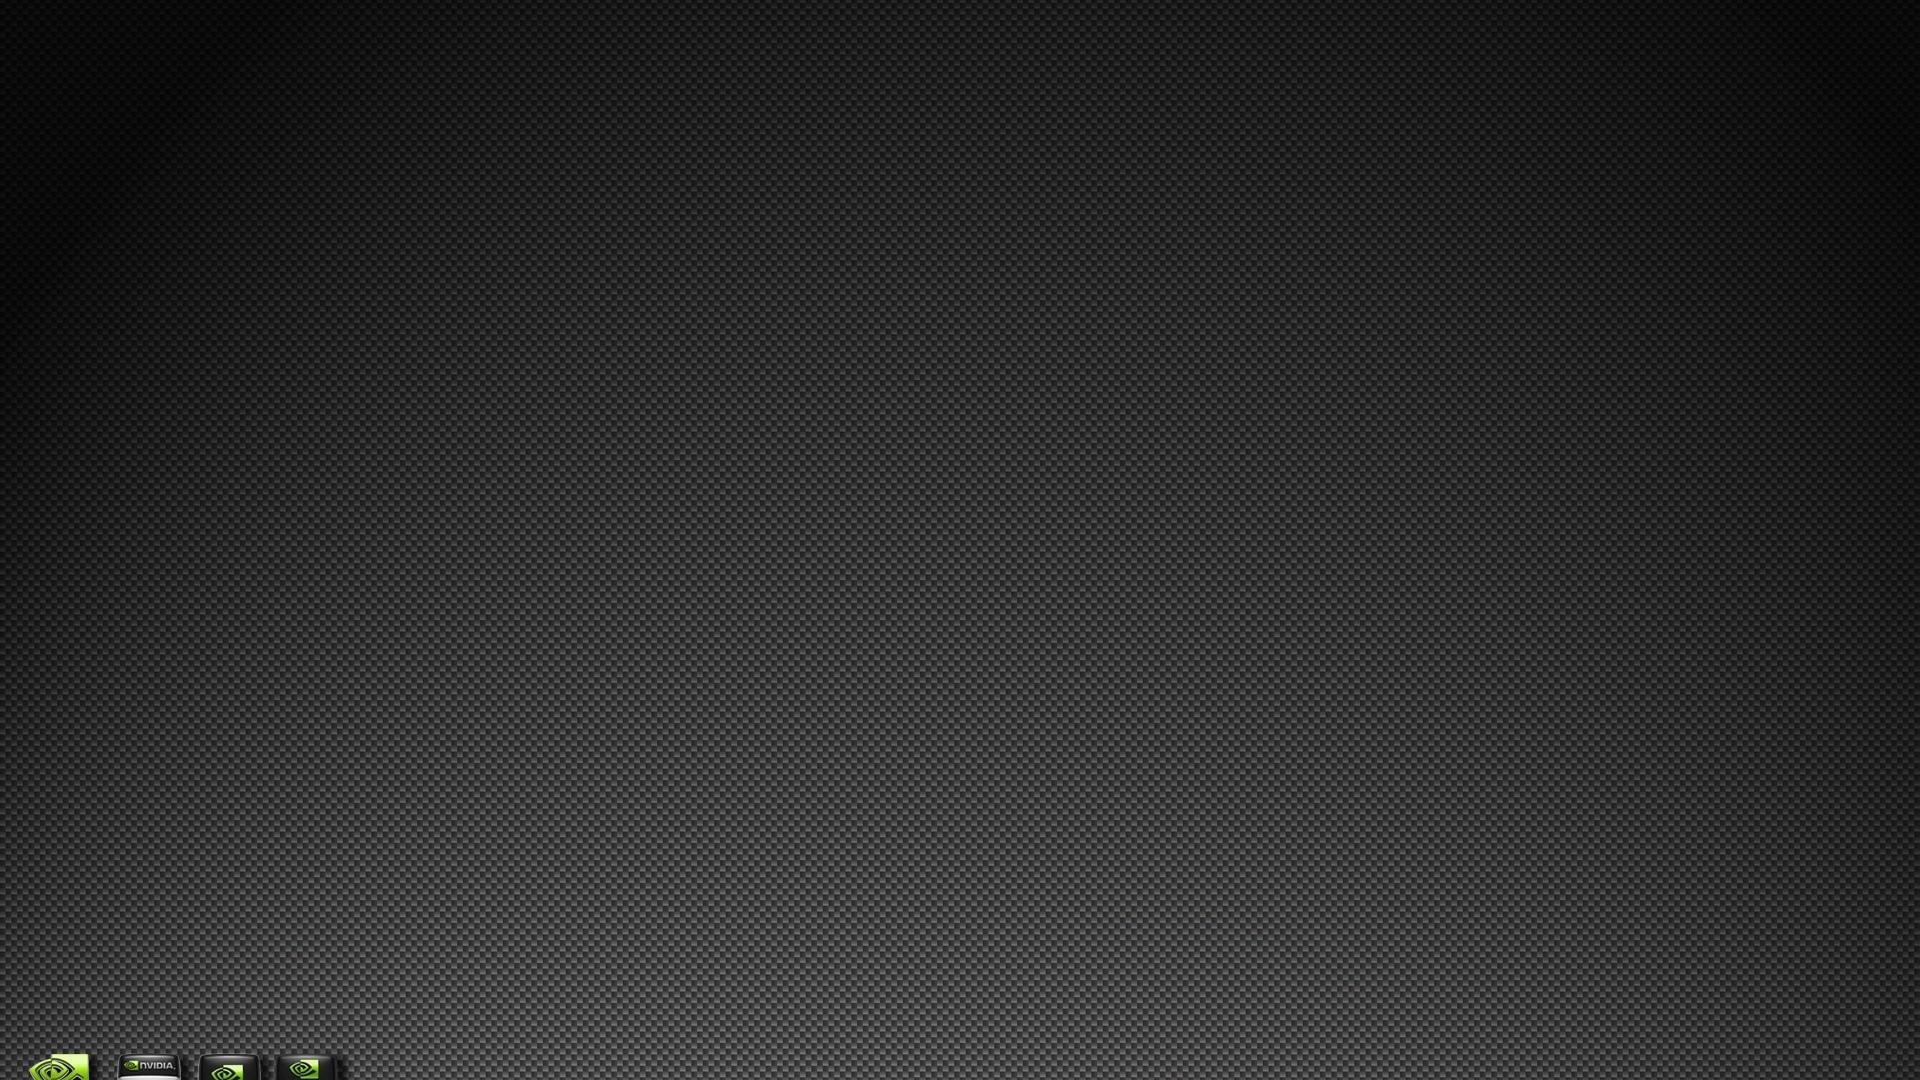 9 HD Carbon Fiber Desktop Wallpapers For Free Download